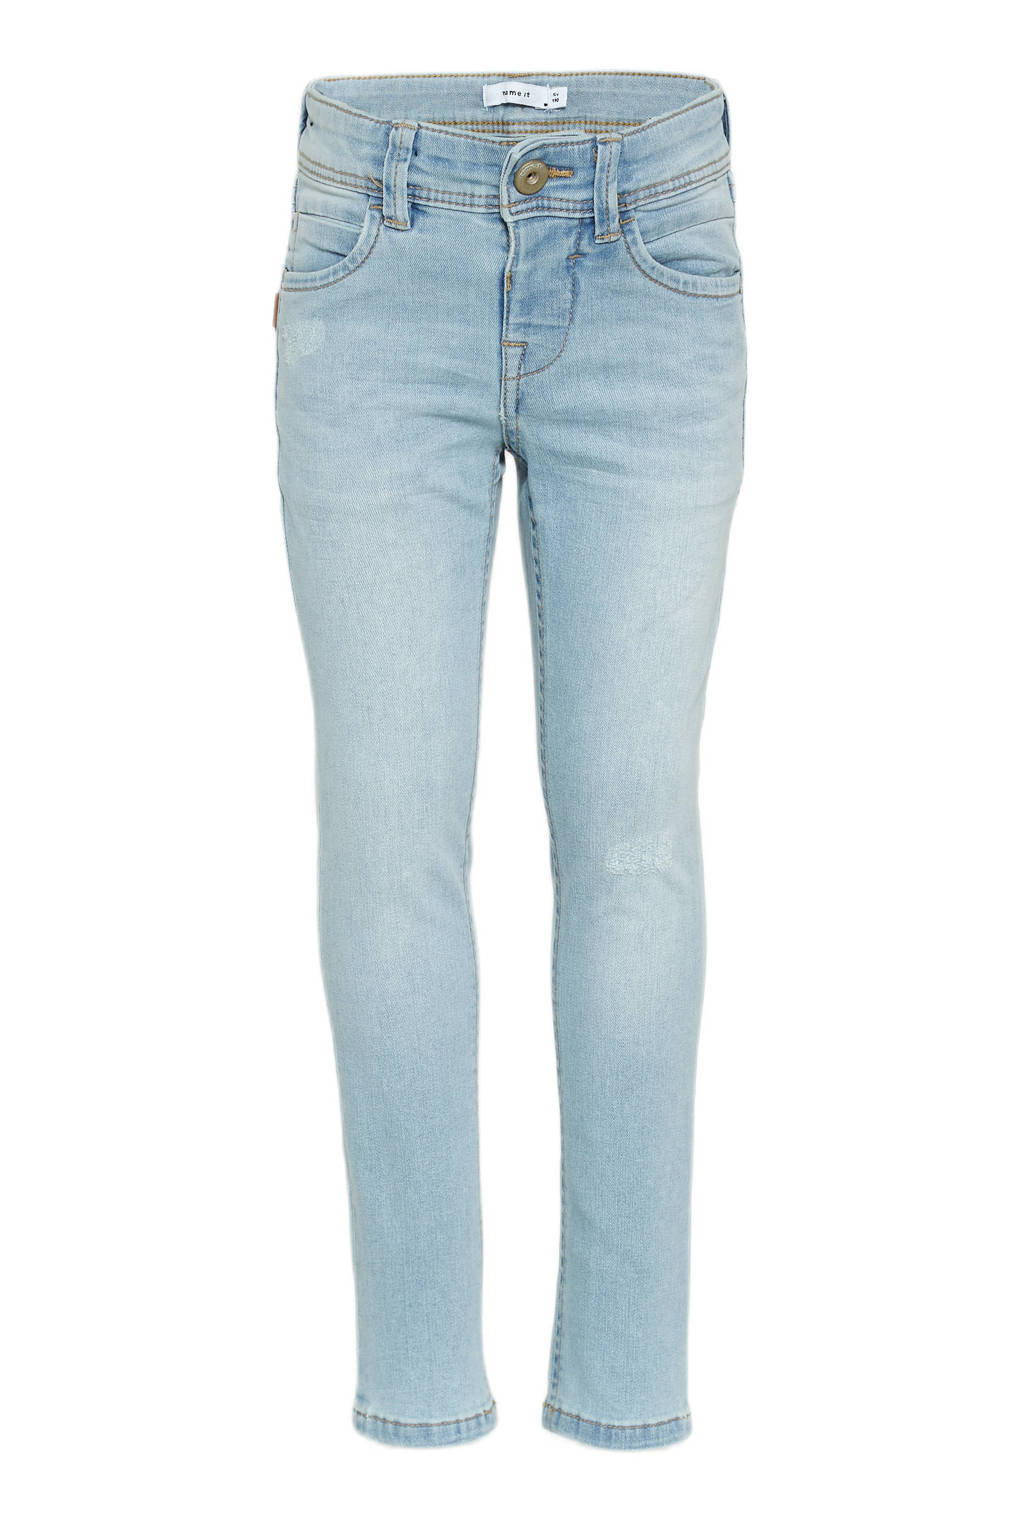 NAME IT KIDS slim fit jeans light blue denim, Light blue denim